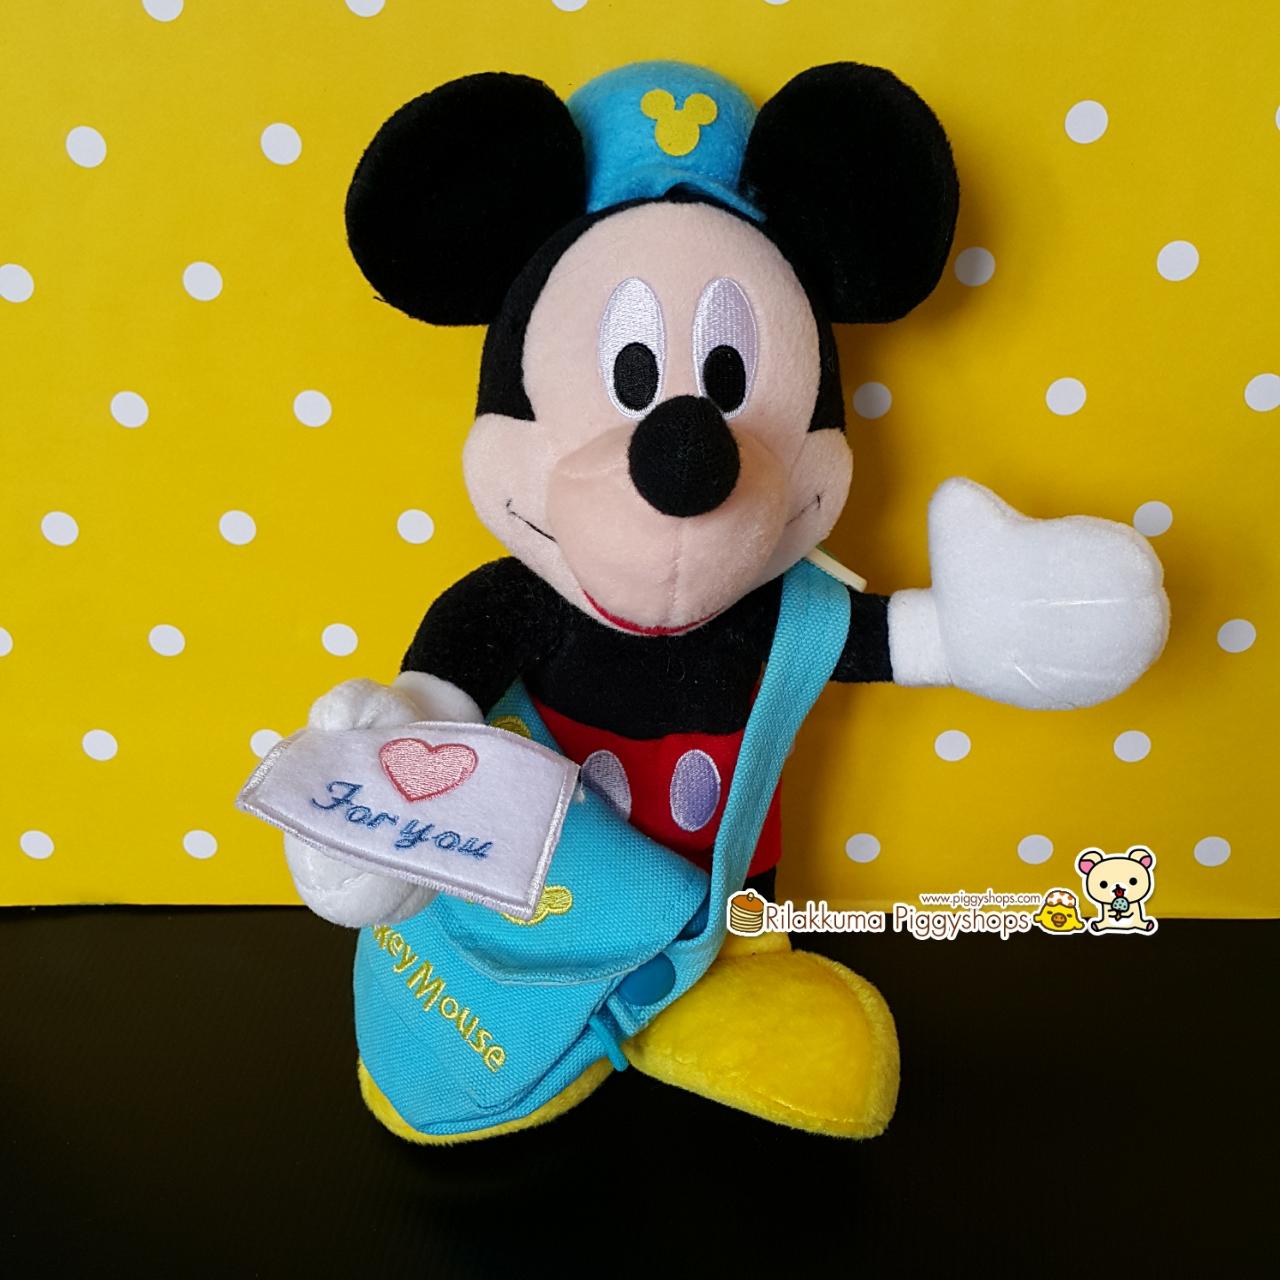 Disney Mickey Mouse postman plush doll ตุ๊กตามิกกี้เม้าส์สะพายกระเป๋าส่งจดหมายปักรูปหัวใจน่ารัก